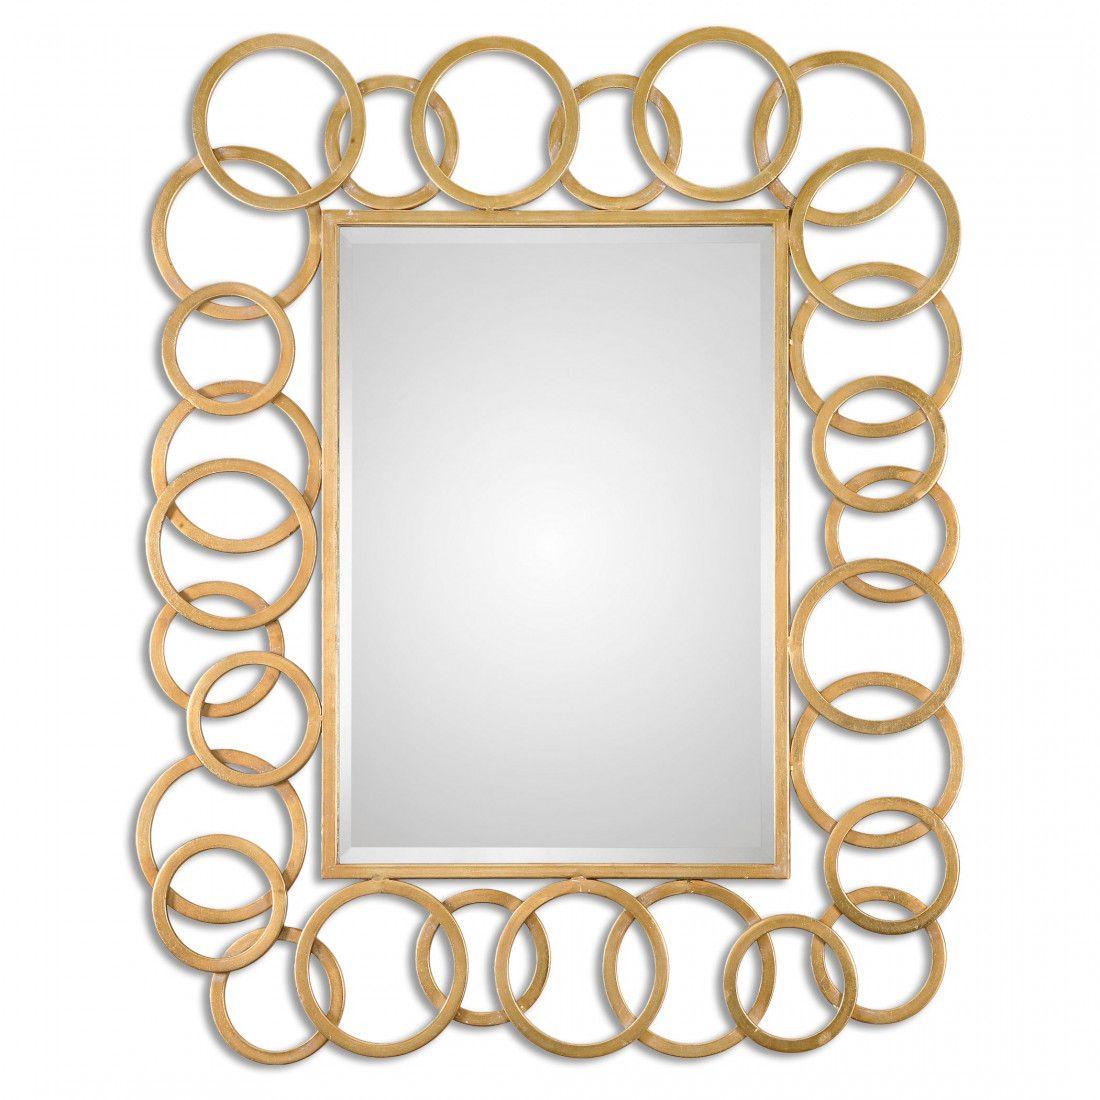 Uttermost Amena Gold Rings Mirror Allison Dining Area